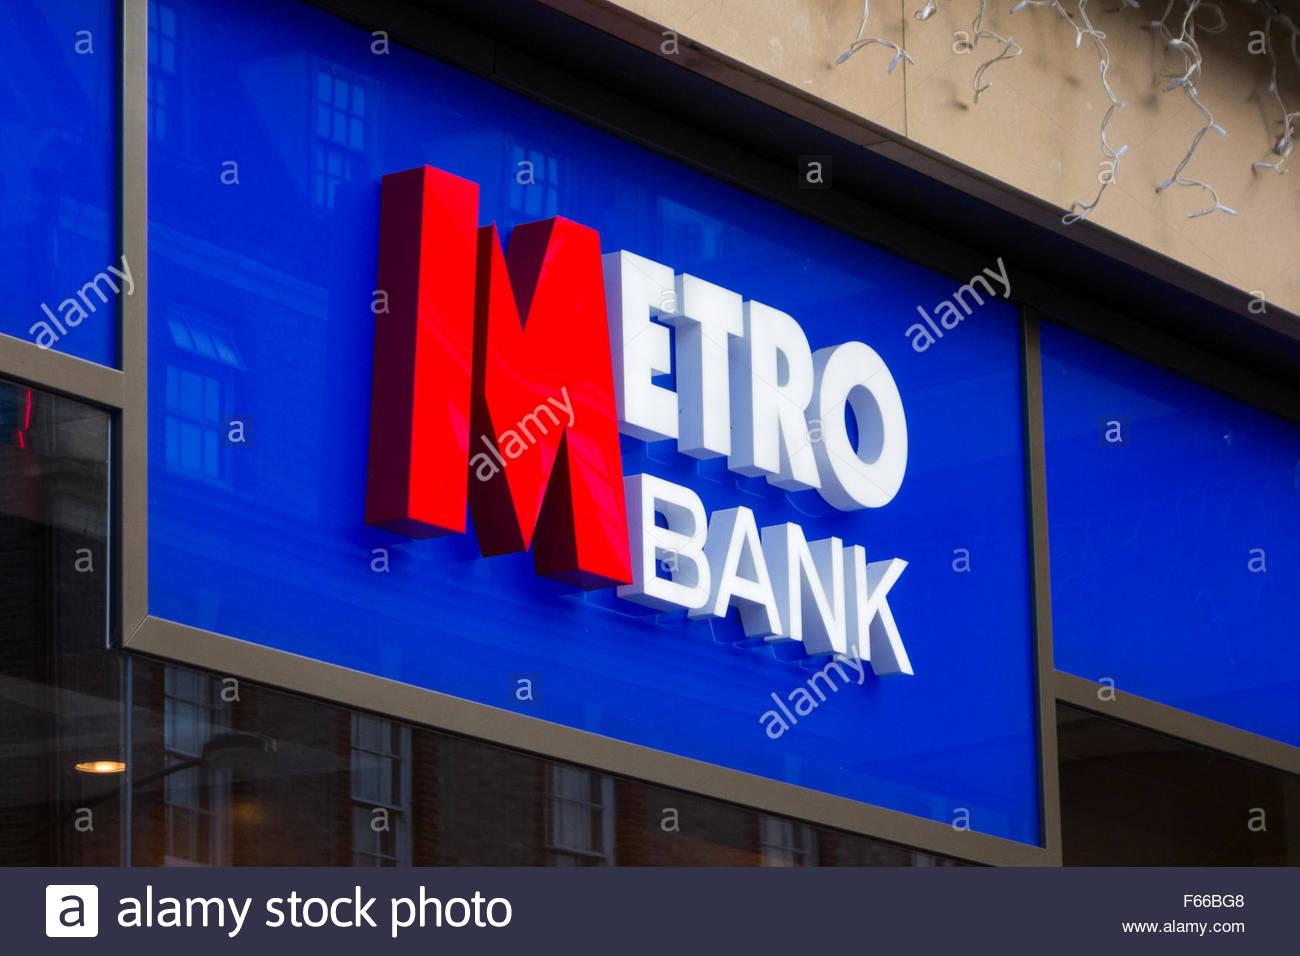 Metro Bank sign in Cambridge, England, UK - Stock Image